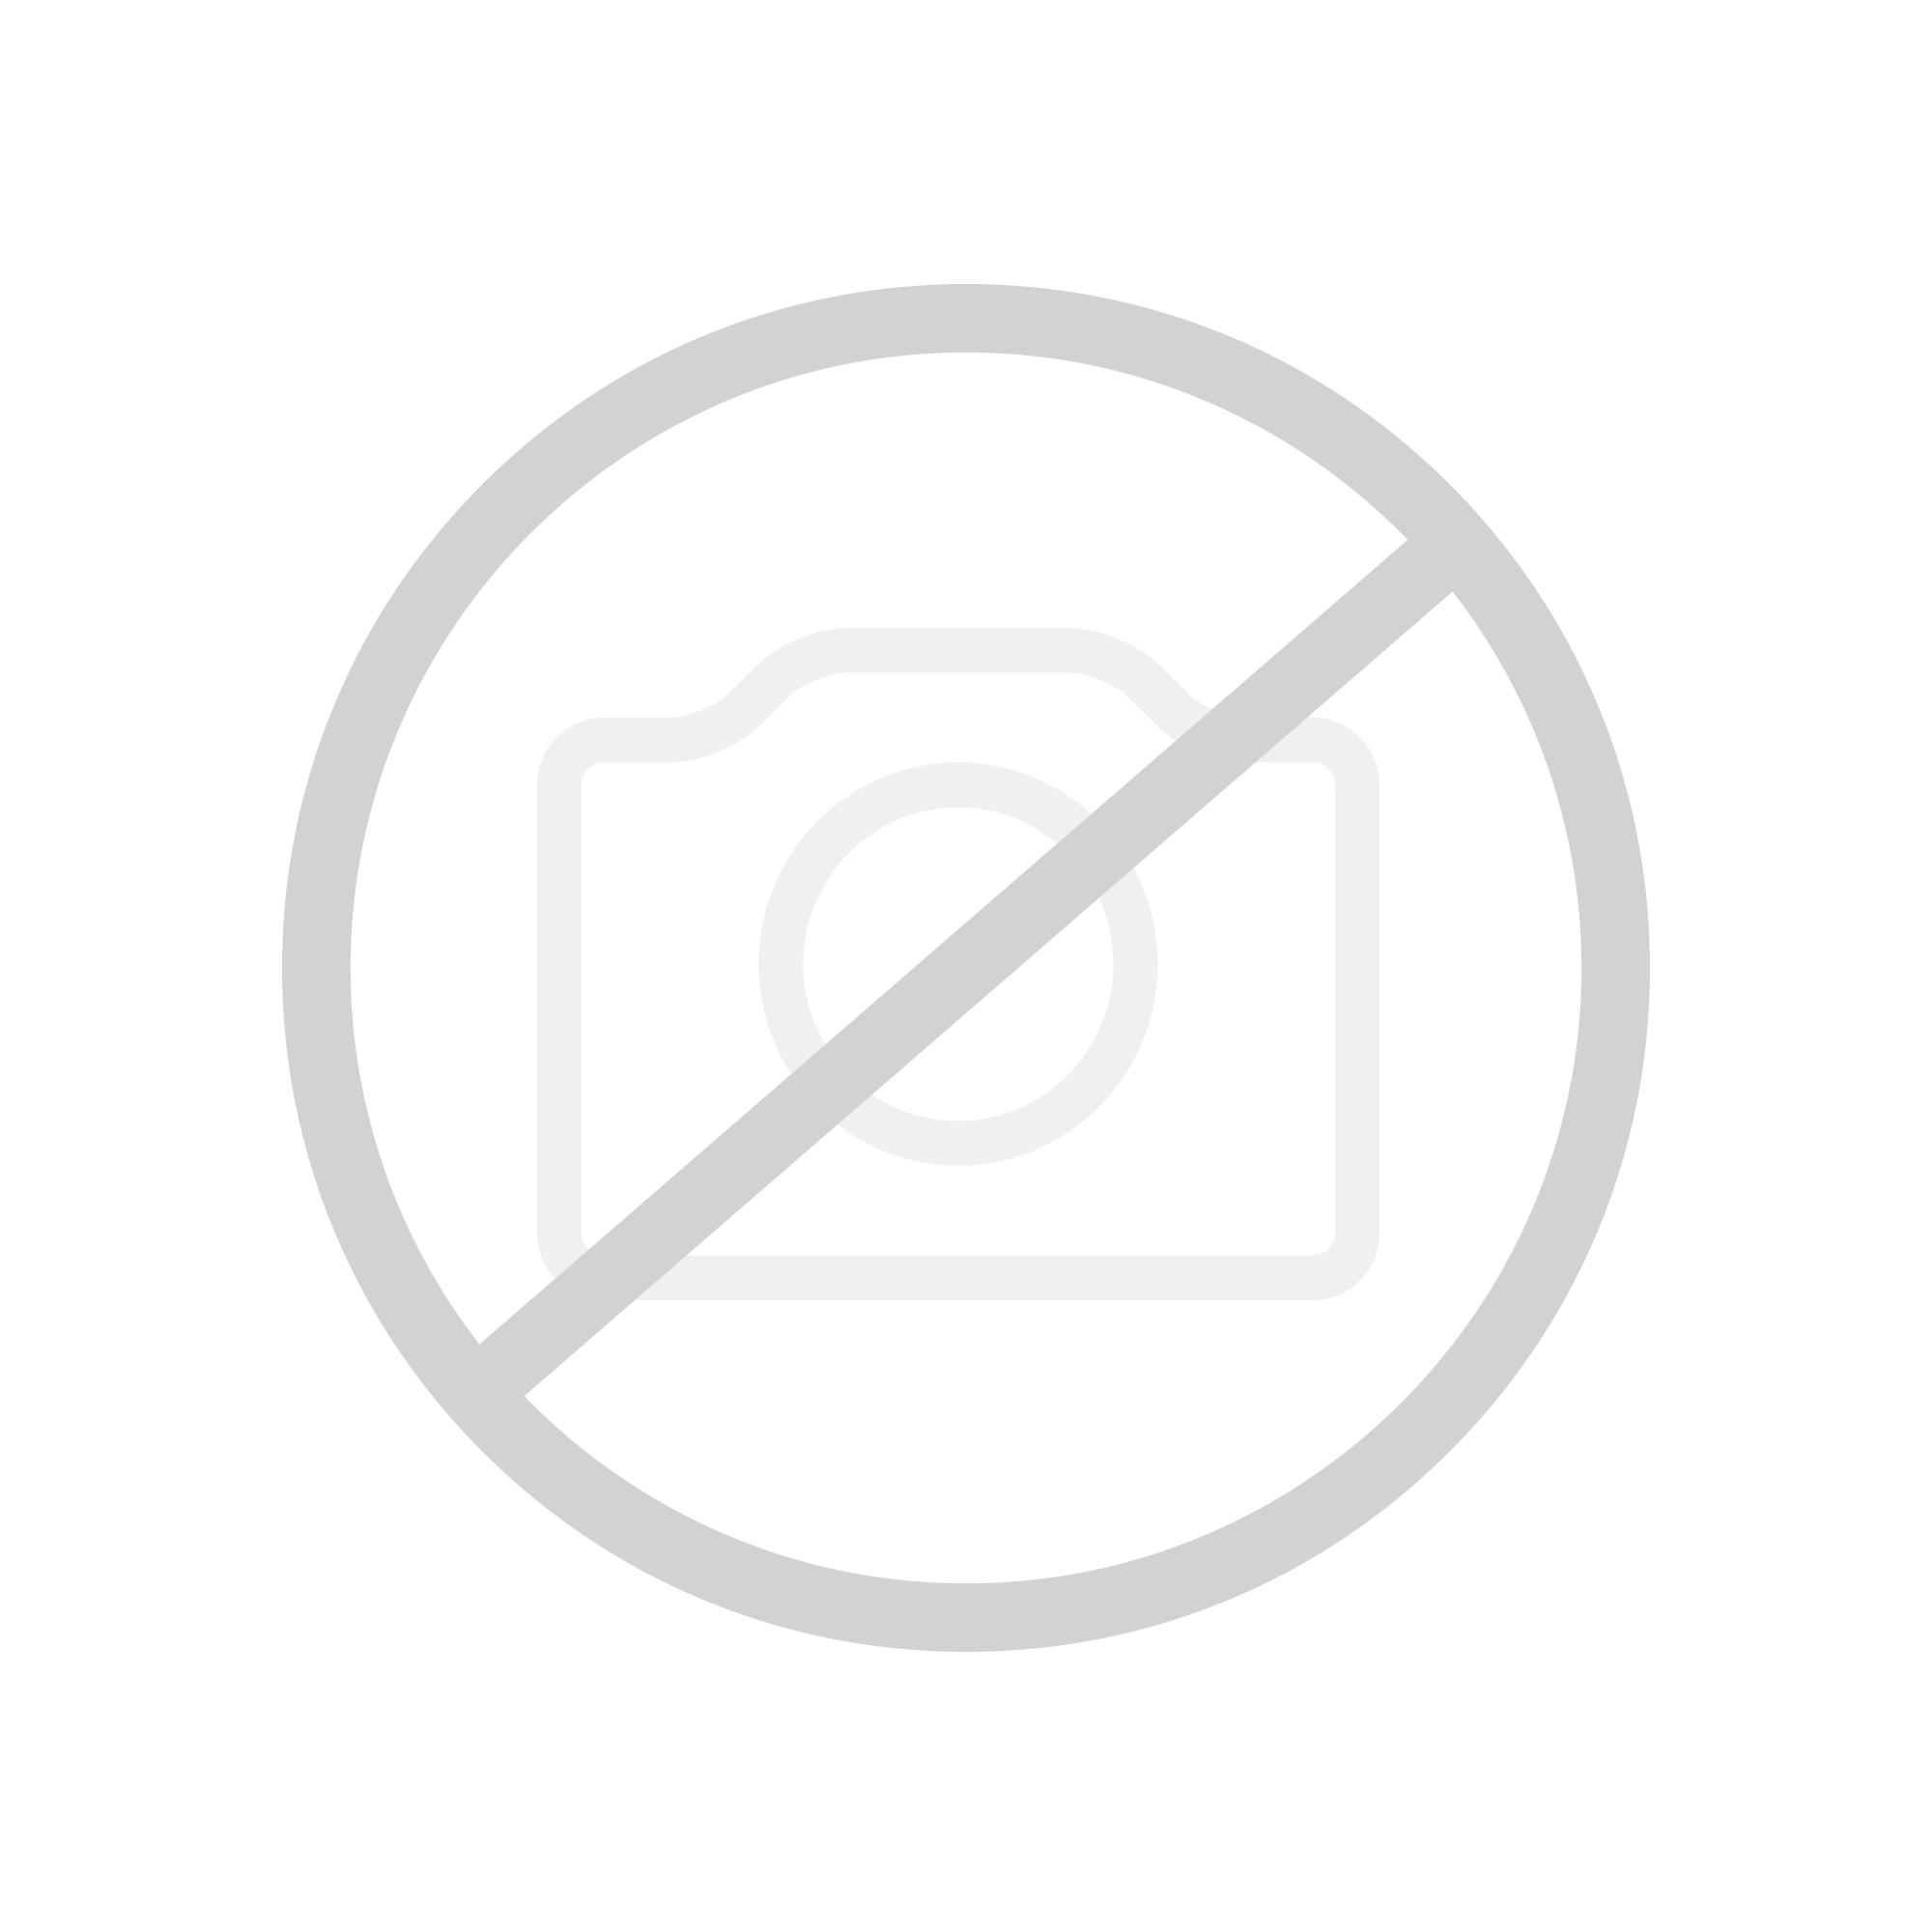 Geberit PE Anschlussgarnitur für Wand-WC Ø 9 L: 30 cm Ø 9 L: 30 cm